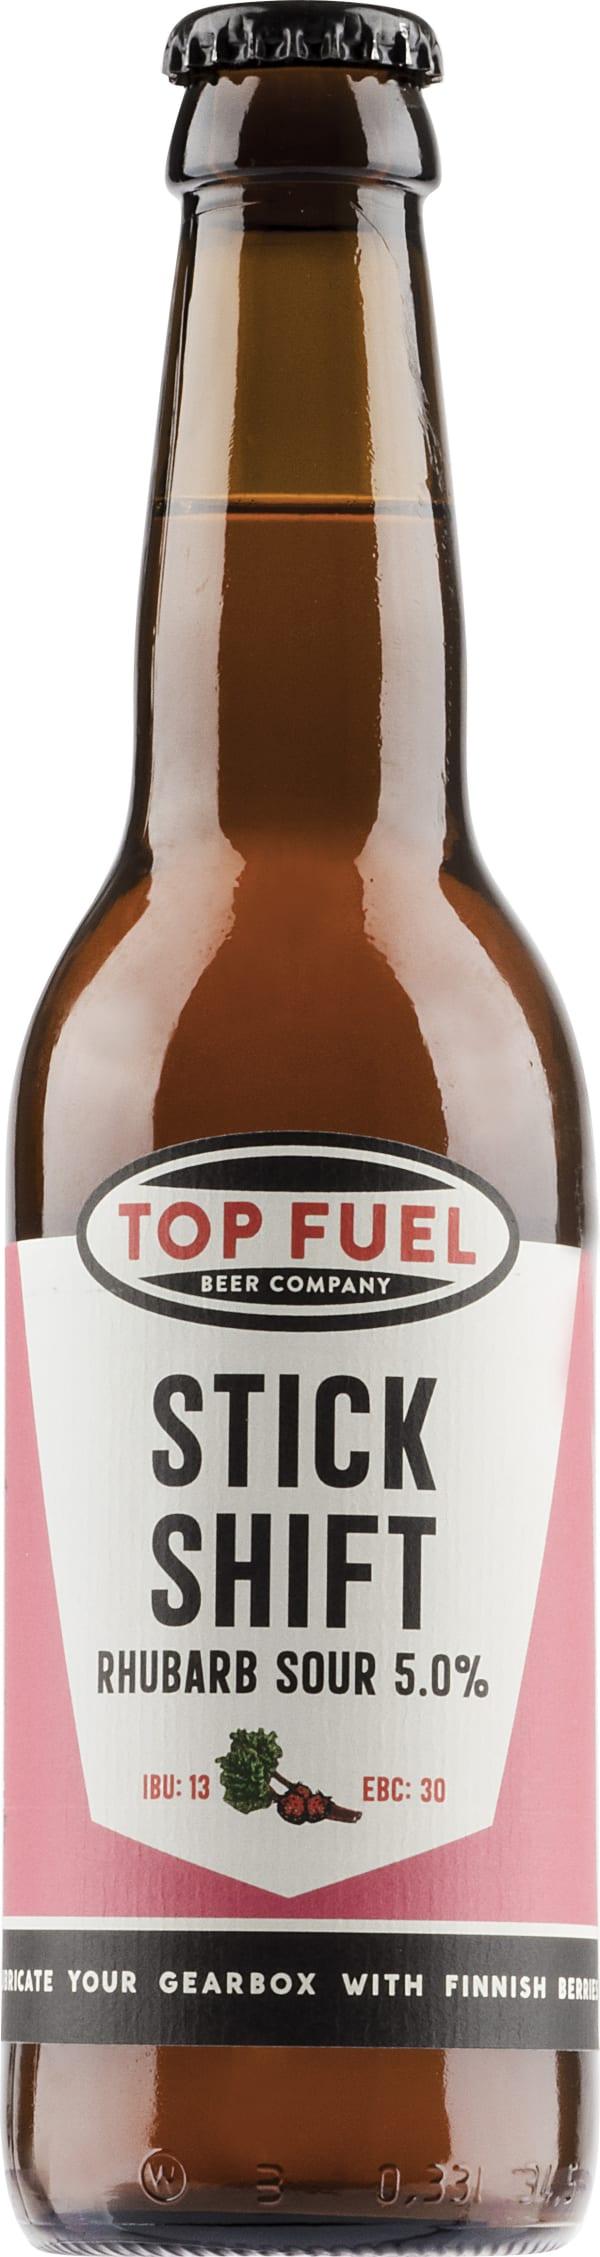 Top Fuel Stick Shift Rhubarb Strawberry Sour